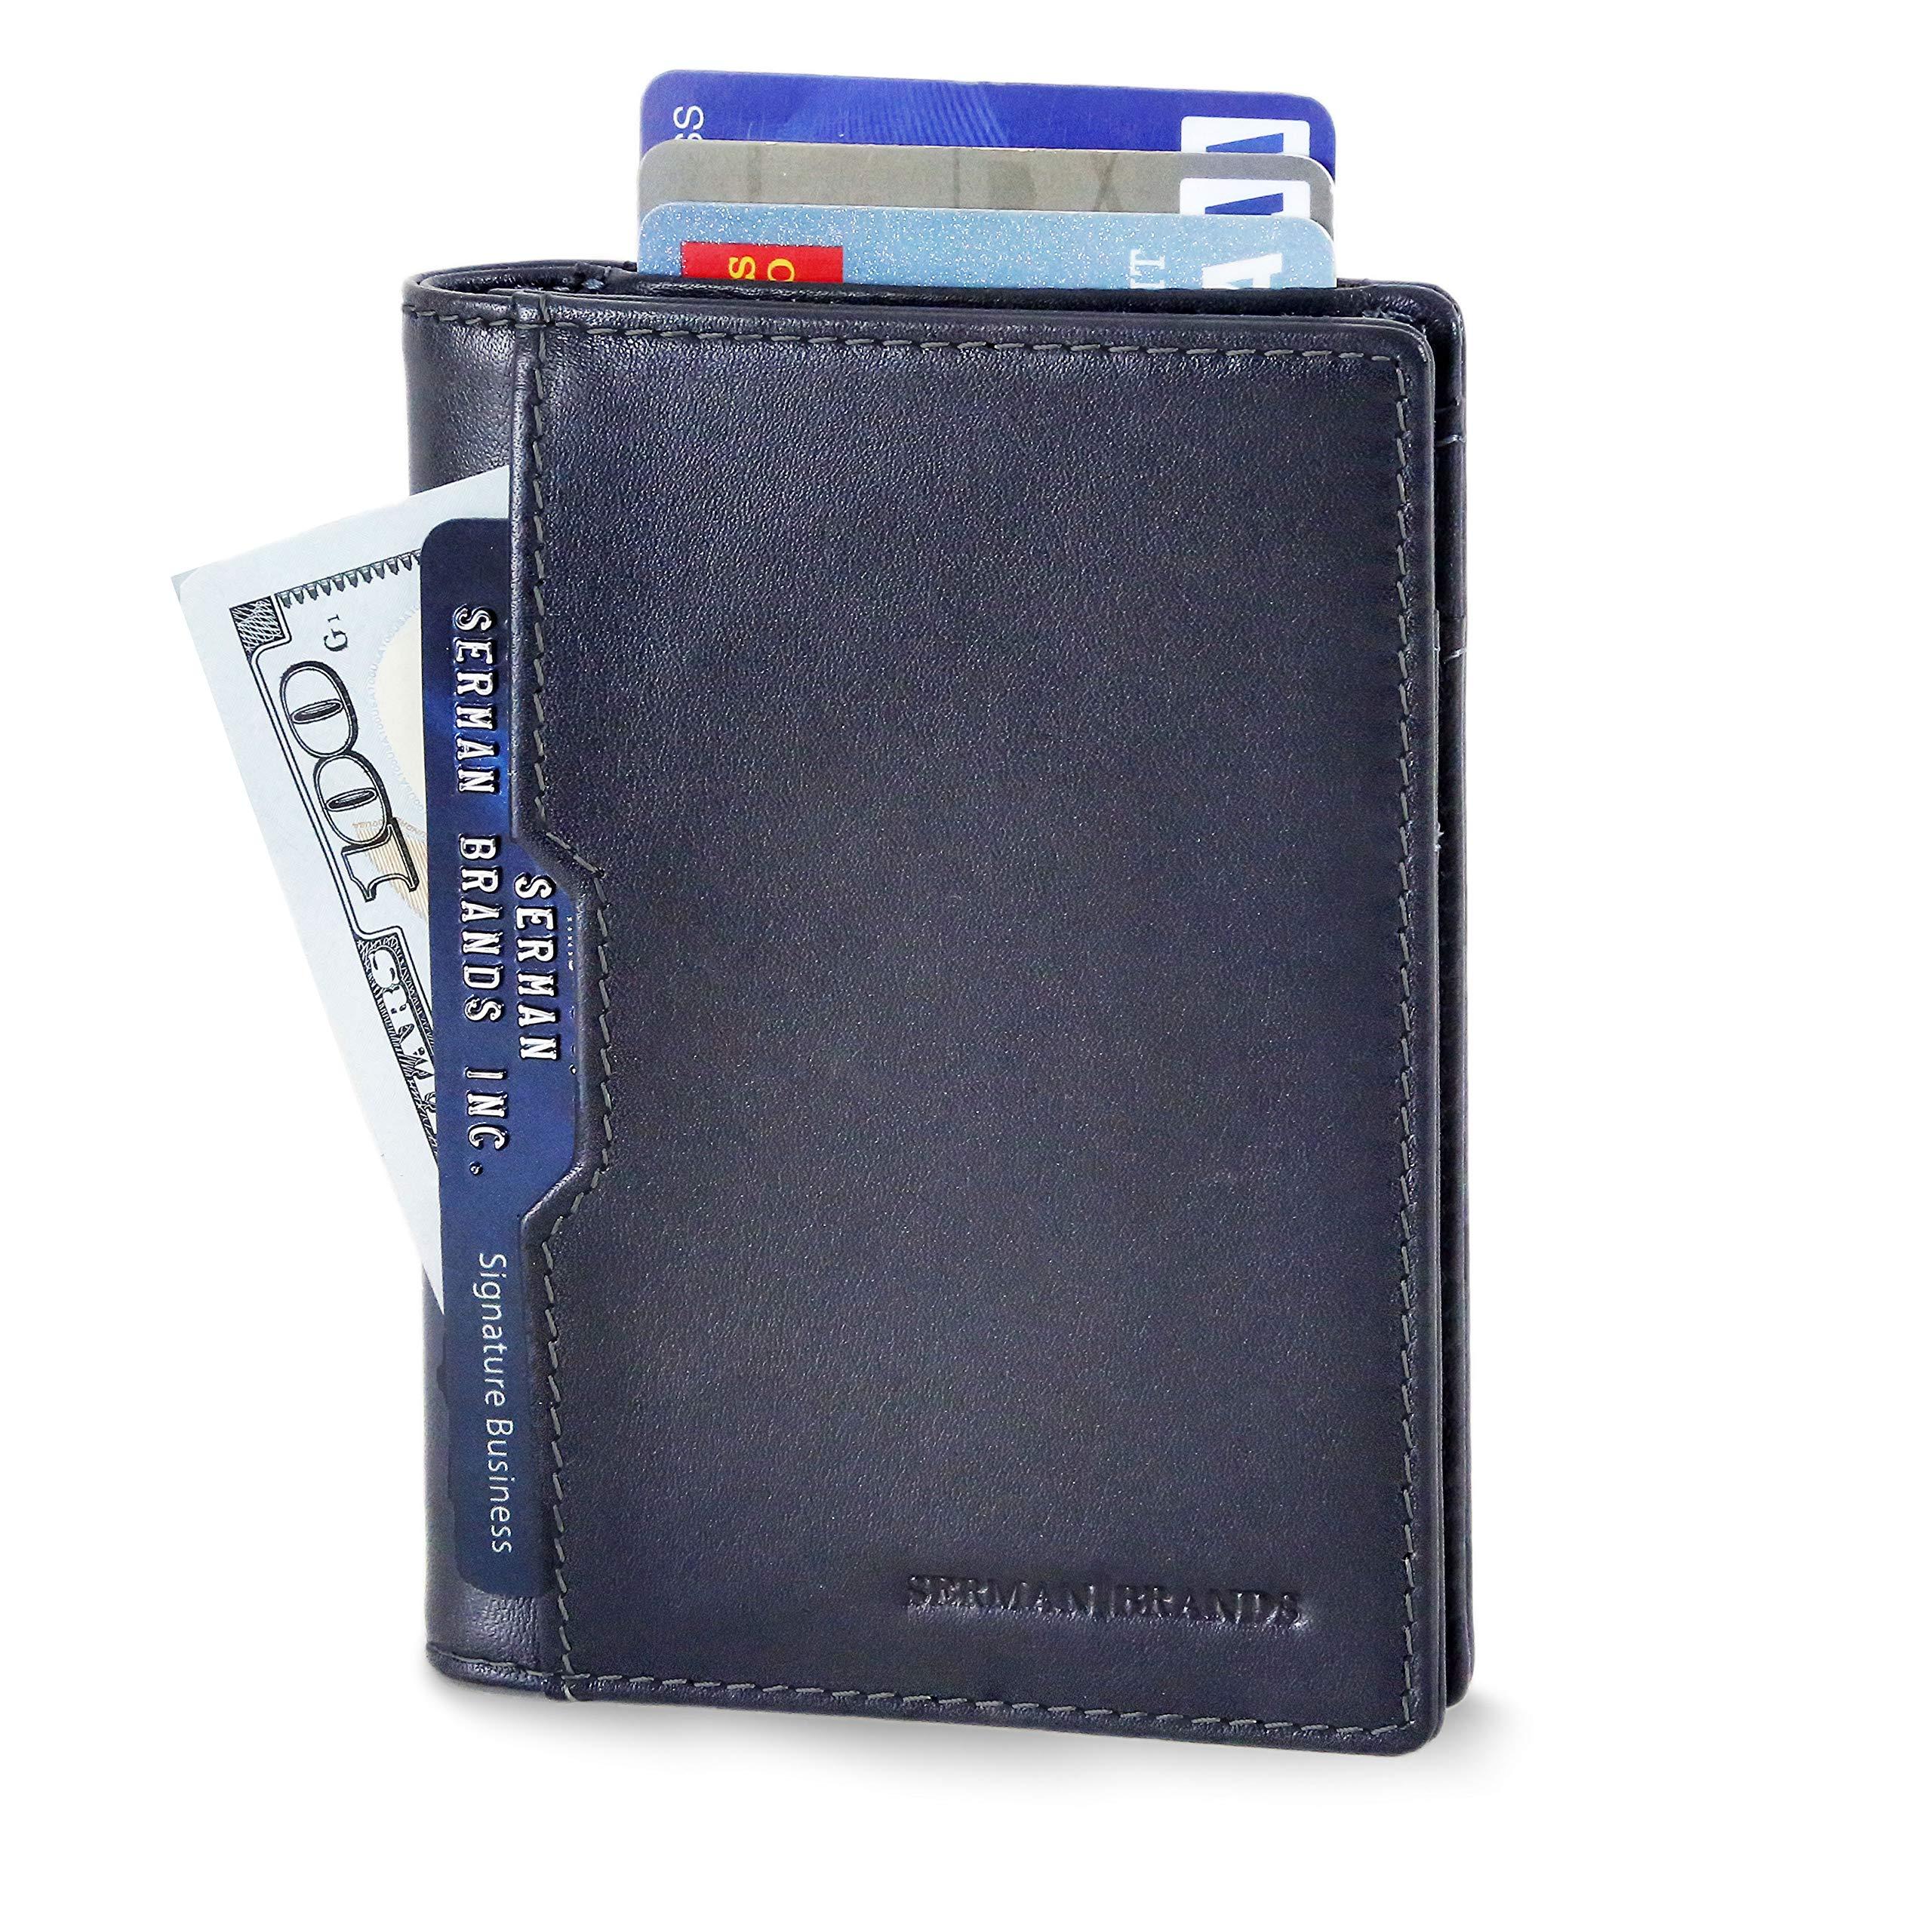 8ddd11de839ceb SERMAN BRANDS - Wallets for Men Slim Mens leather RFID Blocking Minimalist  Card Front Pocket Bifold